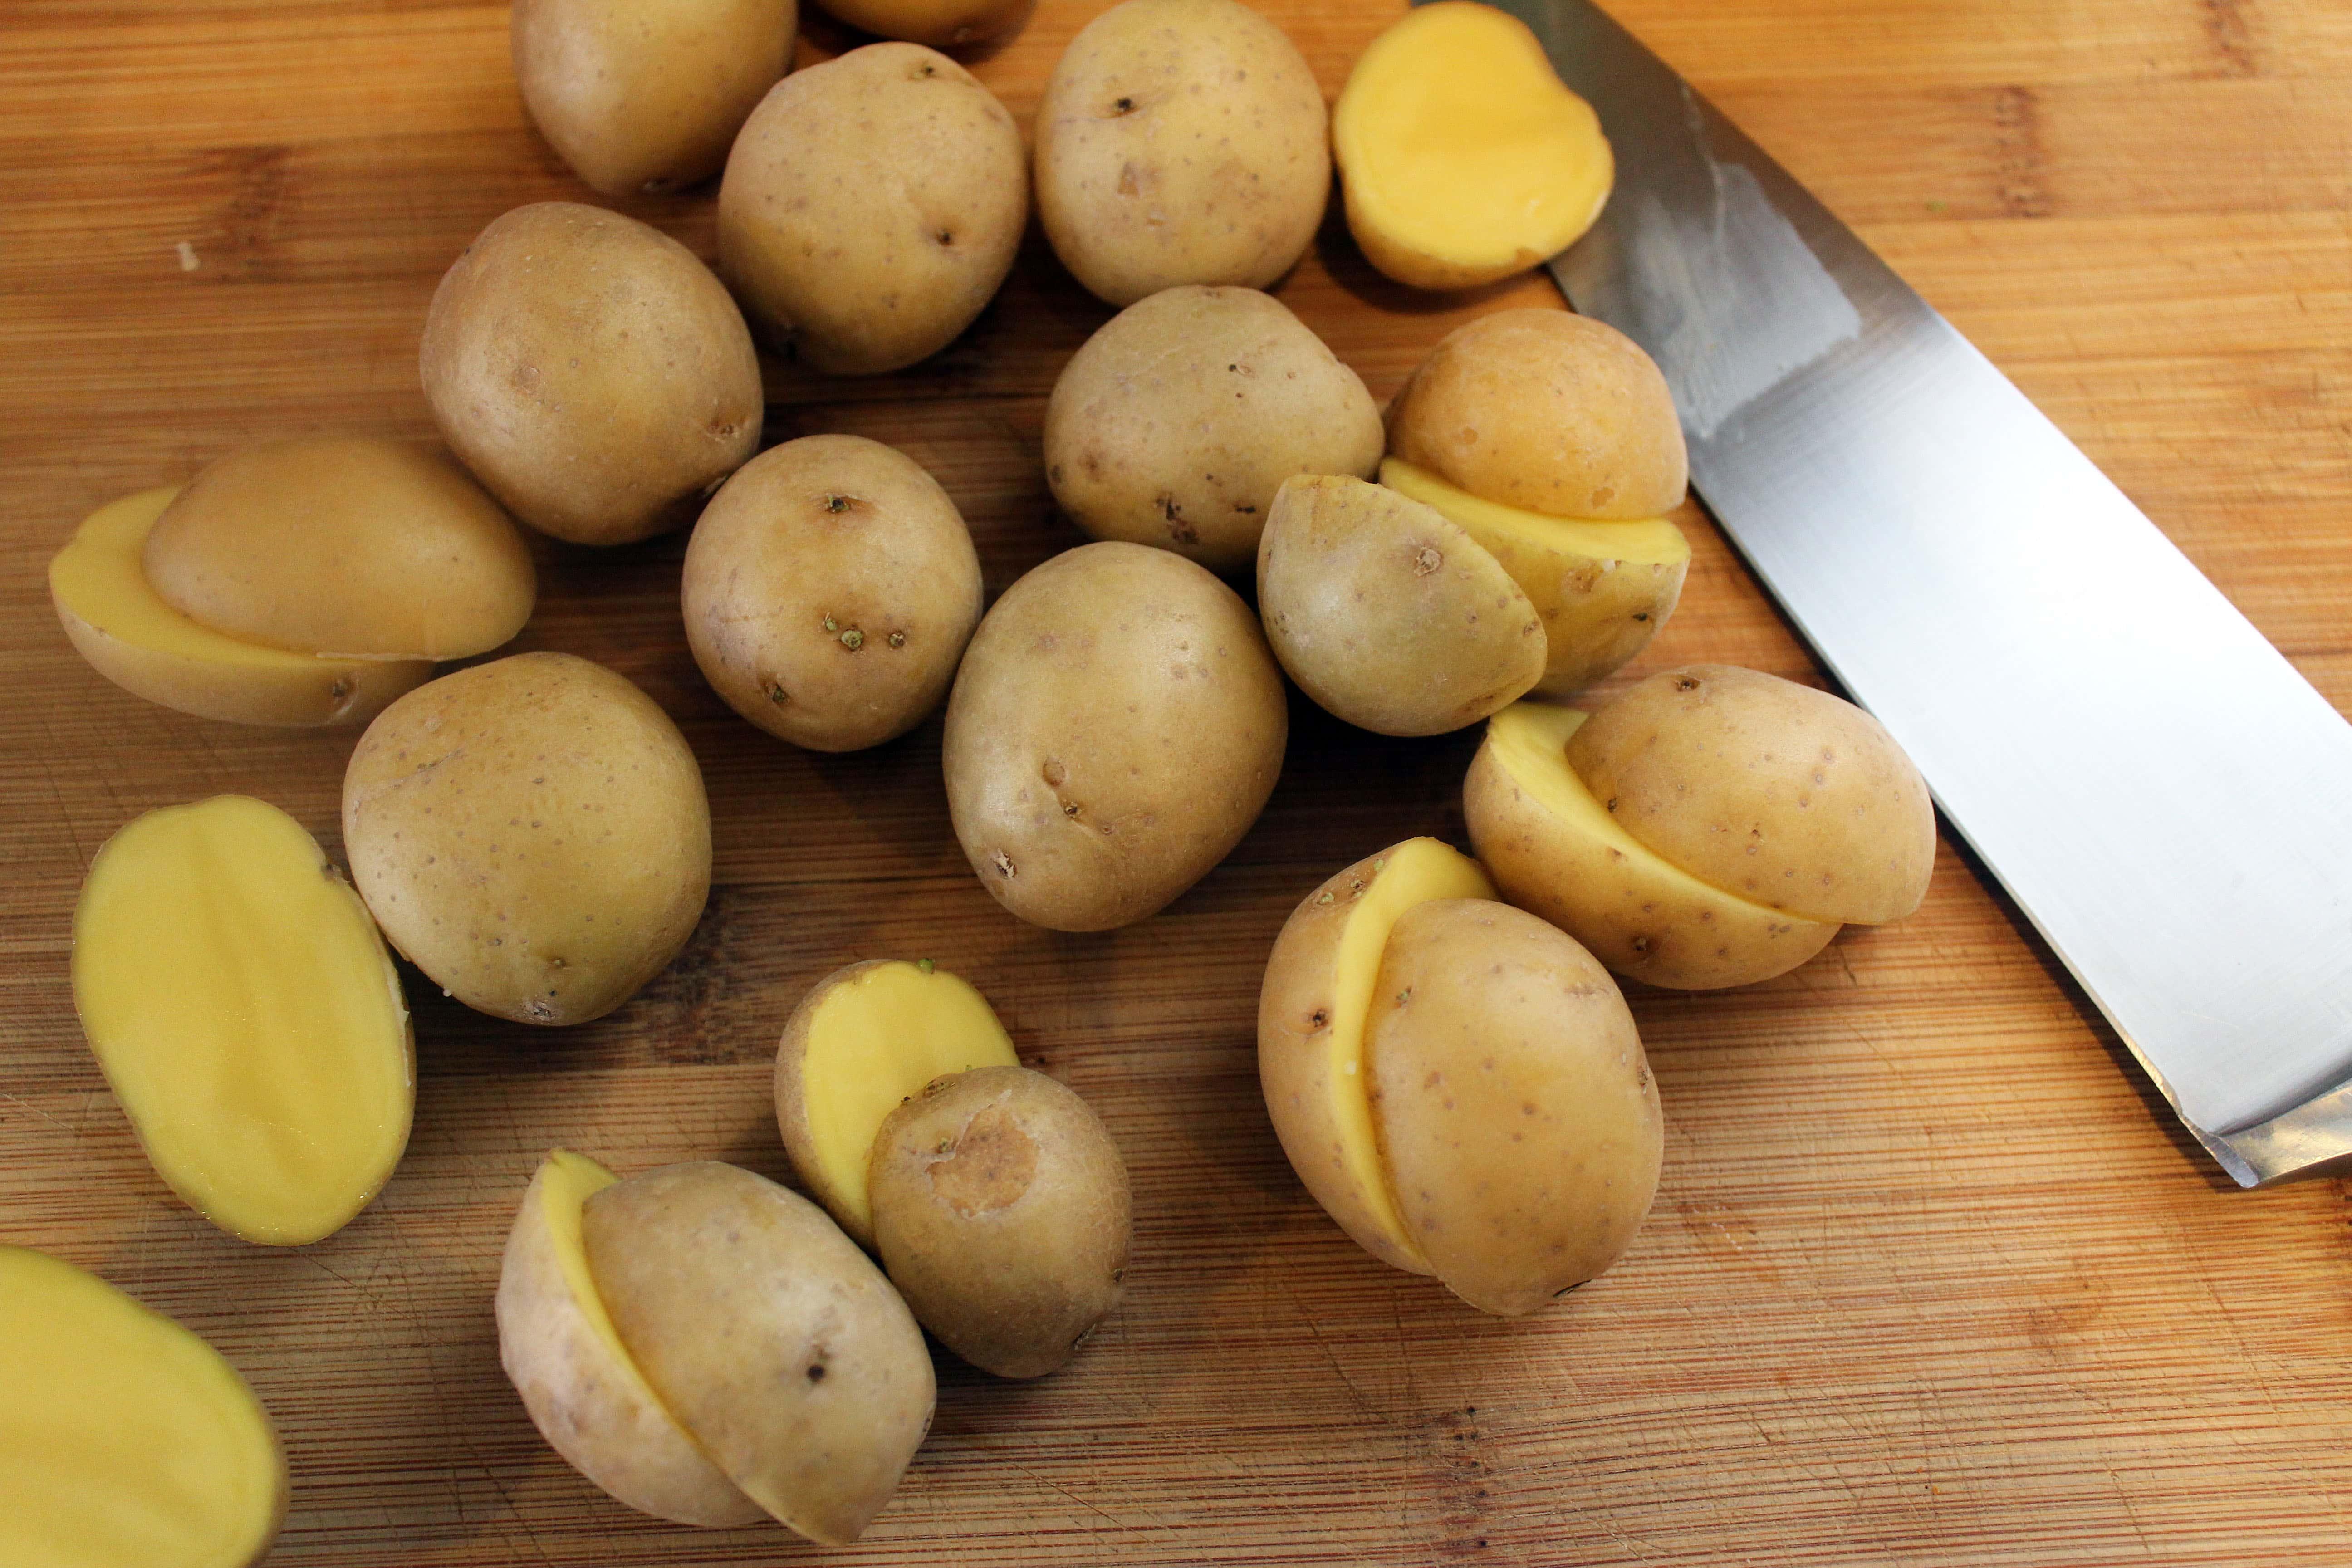 Cut potatoes in half